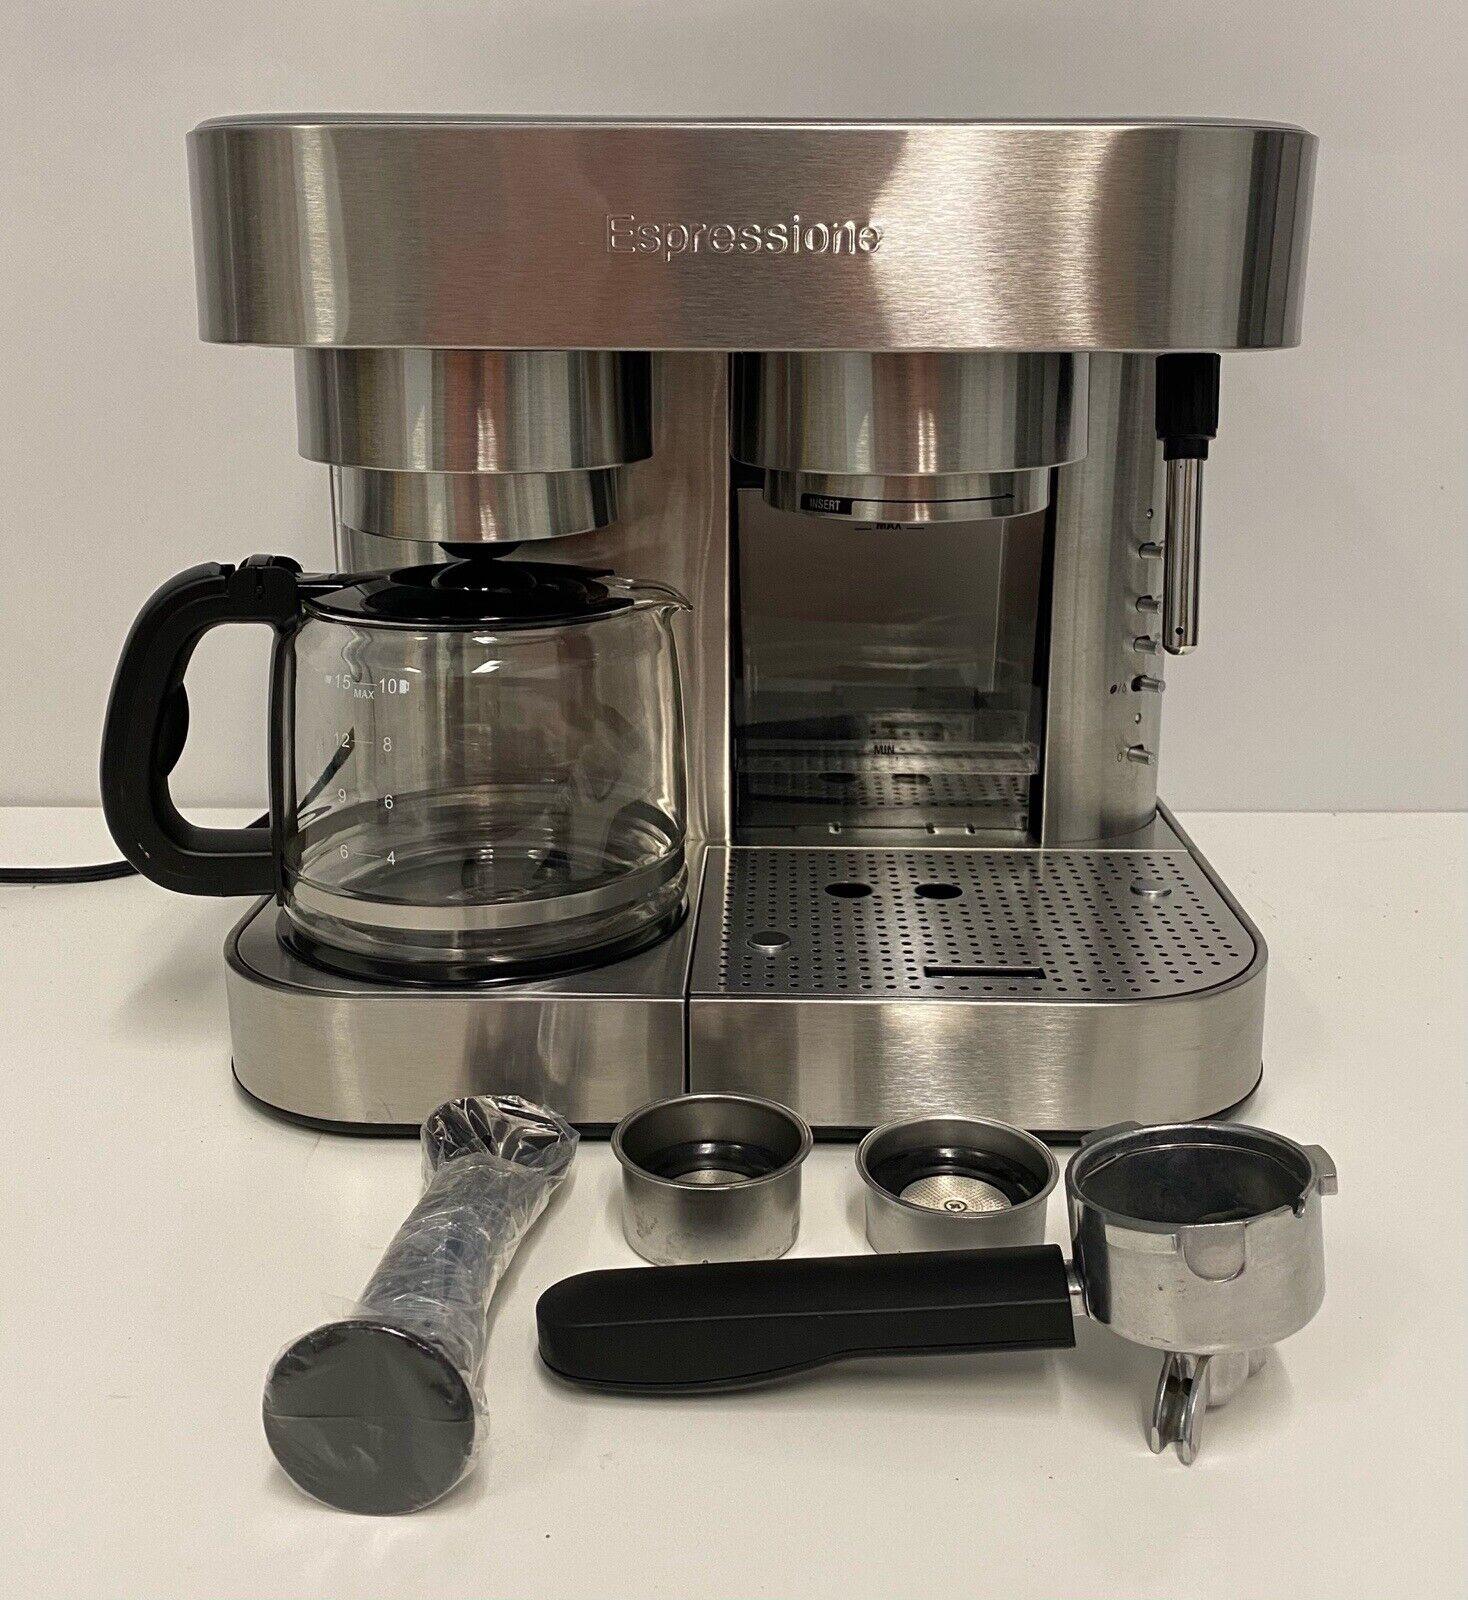 Espressione Em 1040 Machine Espresso And Coffee Maker Stainless Steel For Sale Online Ebay